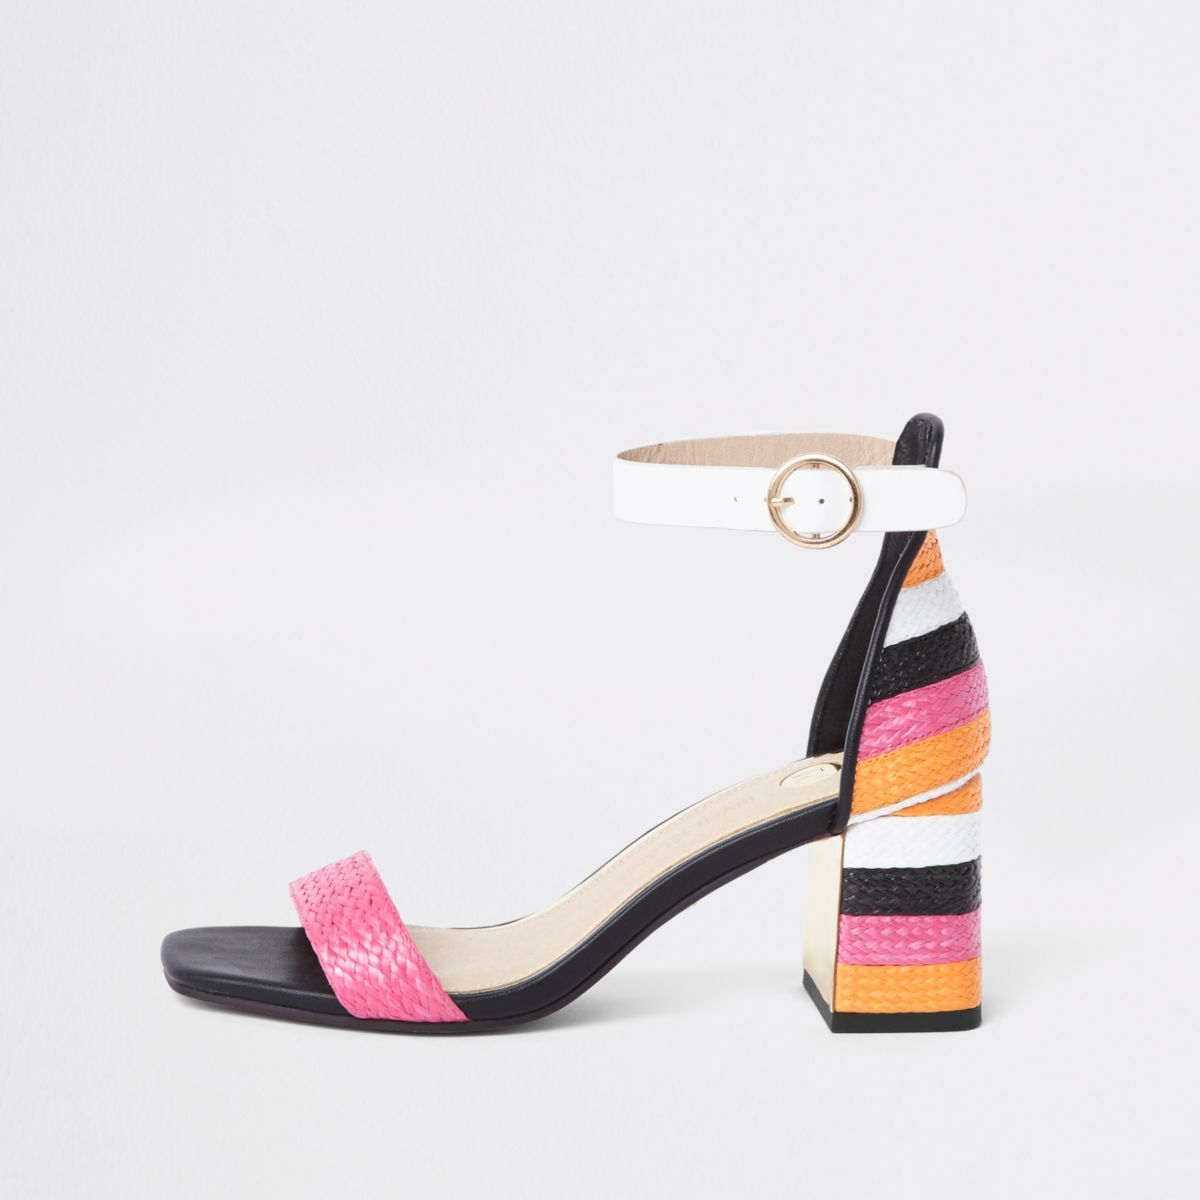 231bee8e5b1 Pink woven metallic block heel sandals - Sandals - Shoes   Boots - women